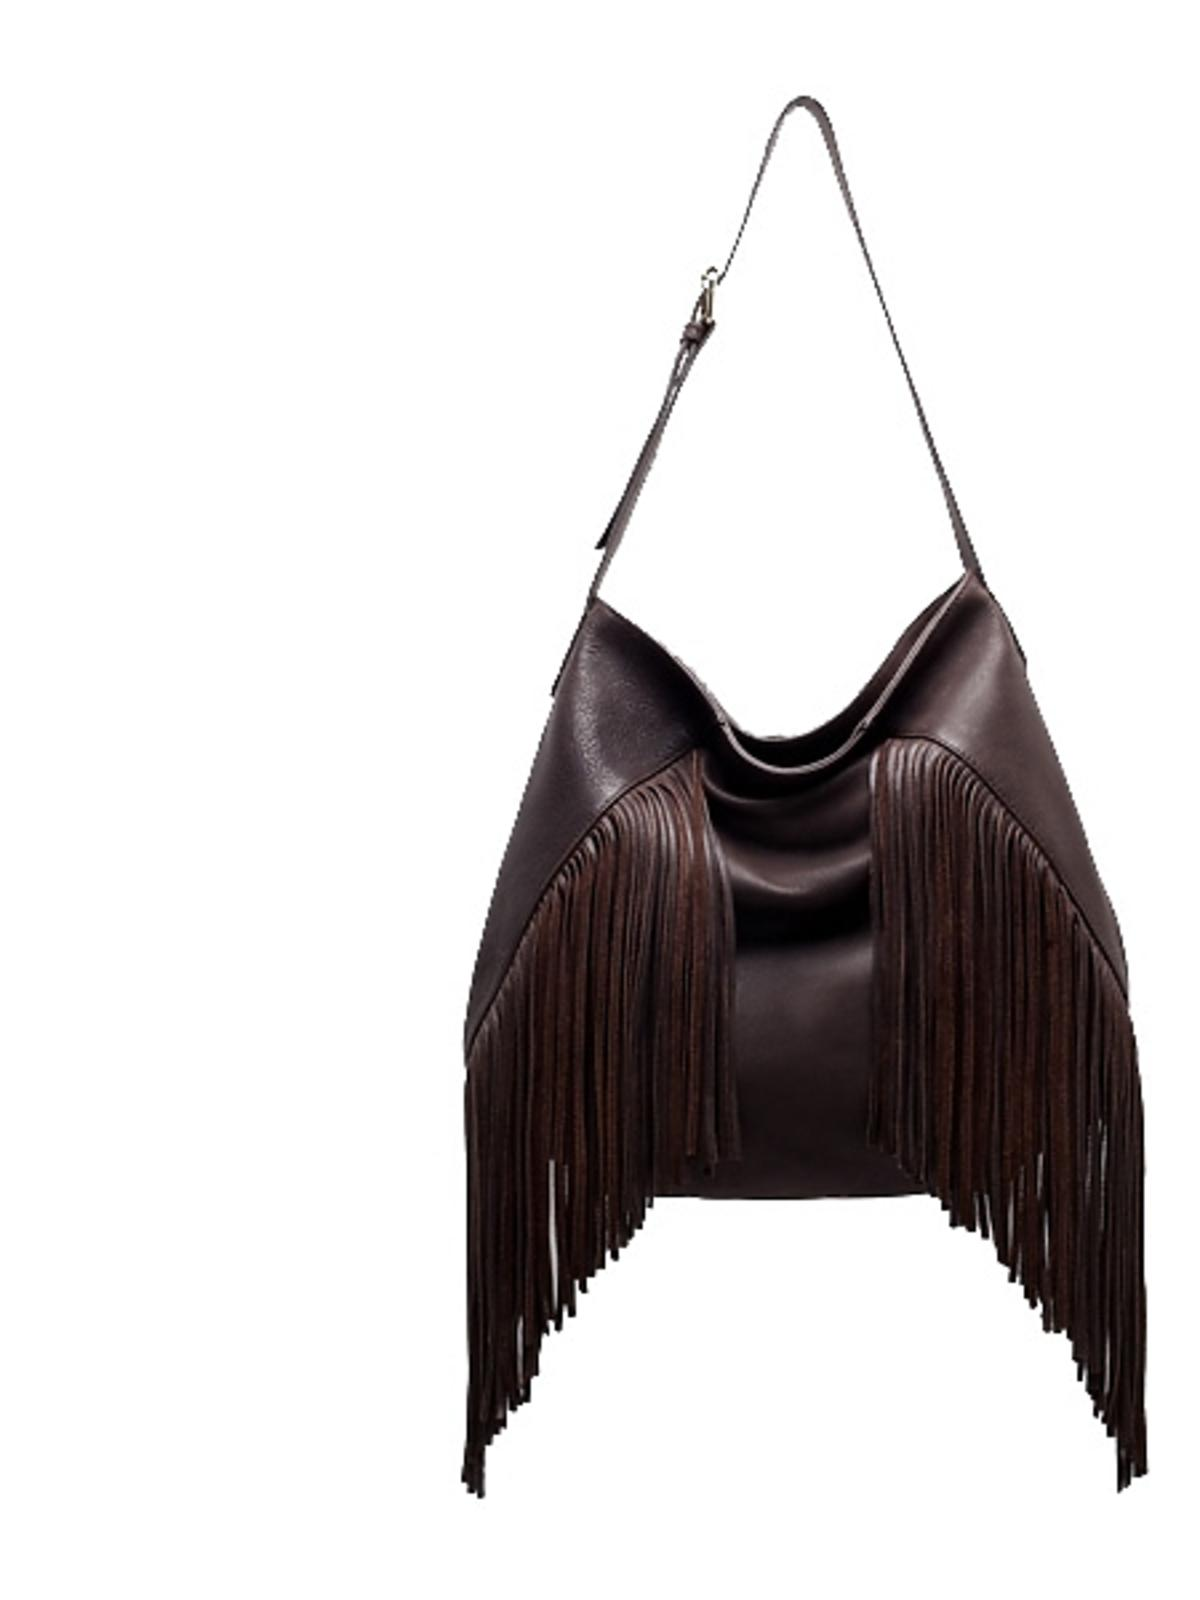 Modna torebka Zara, cena